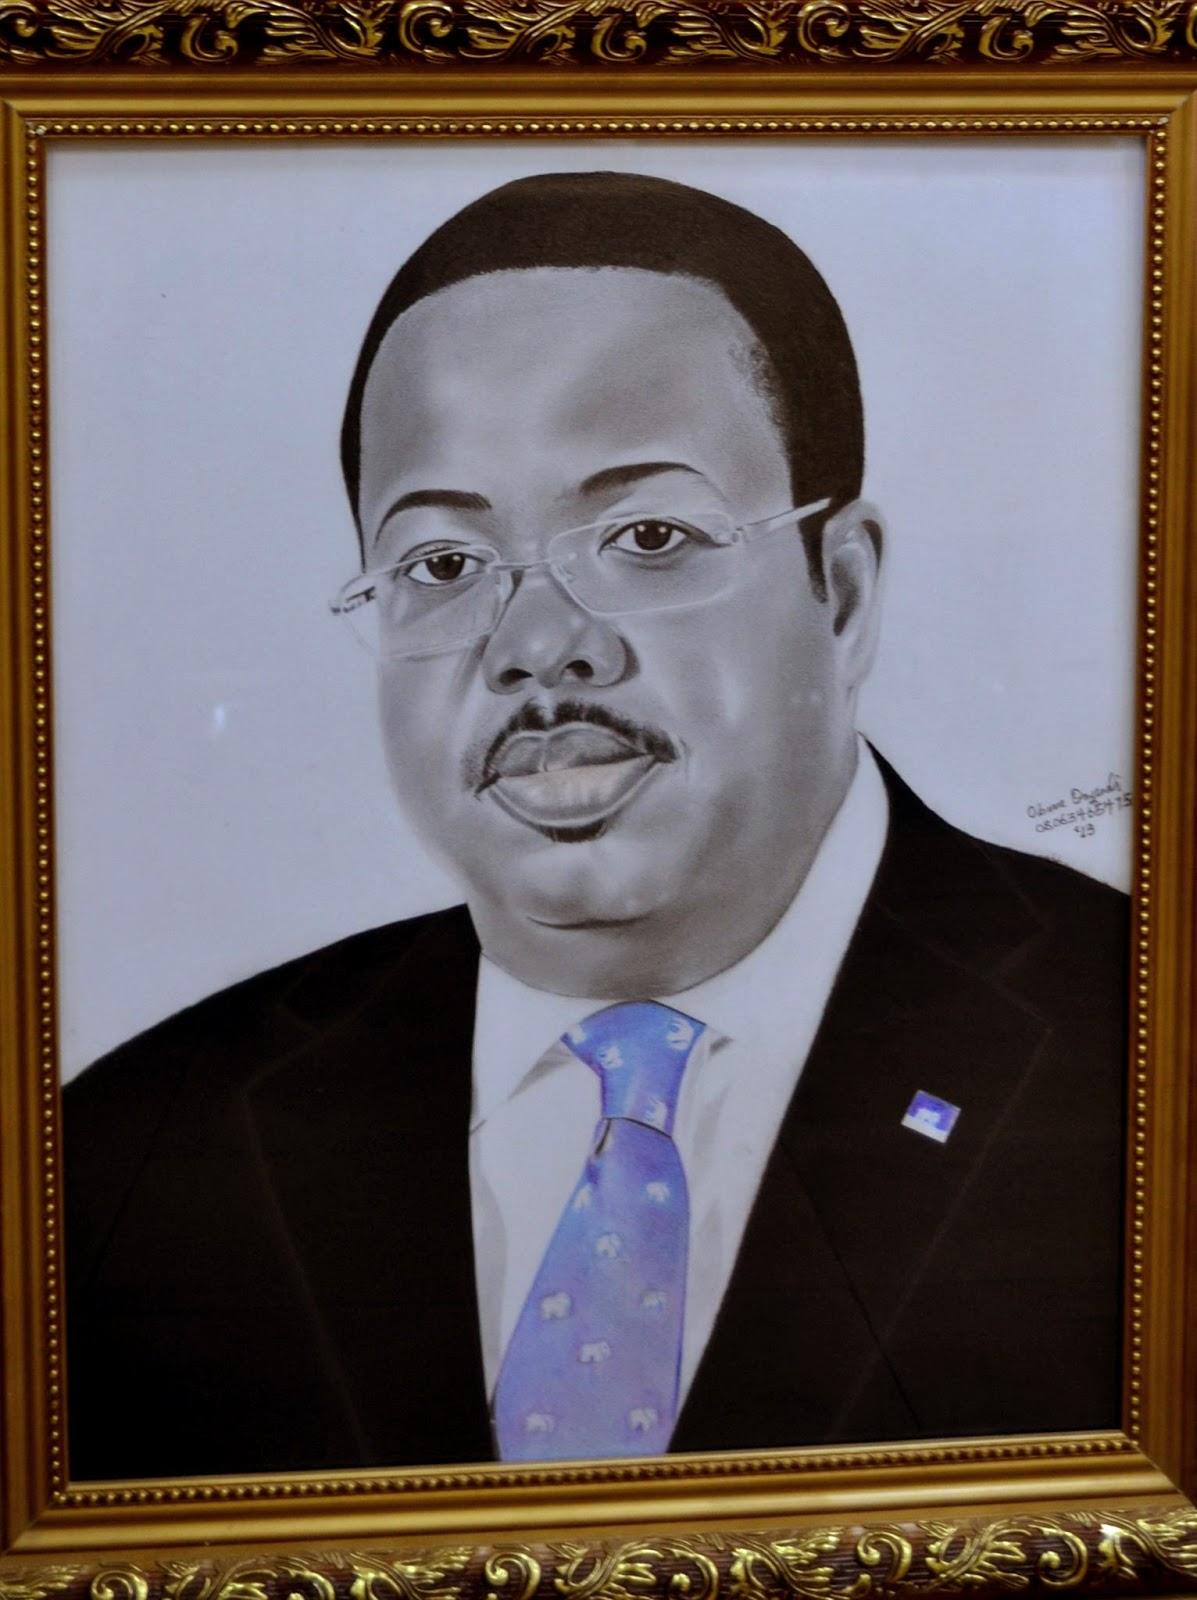 CEO of First Bank Nigeria Stephen Onasanya's realistic pencil drawing